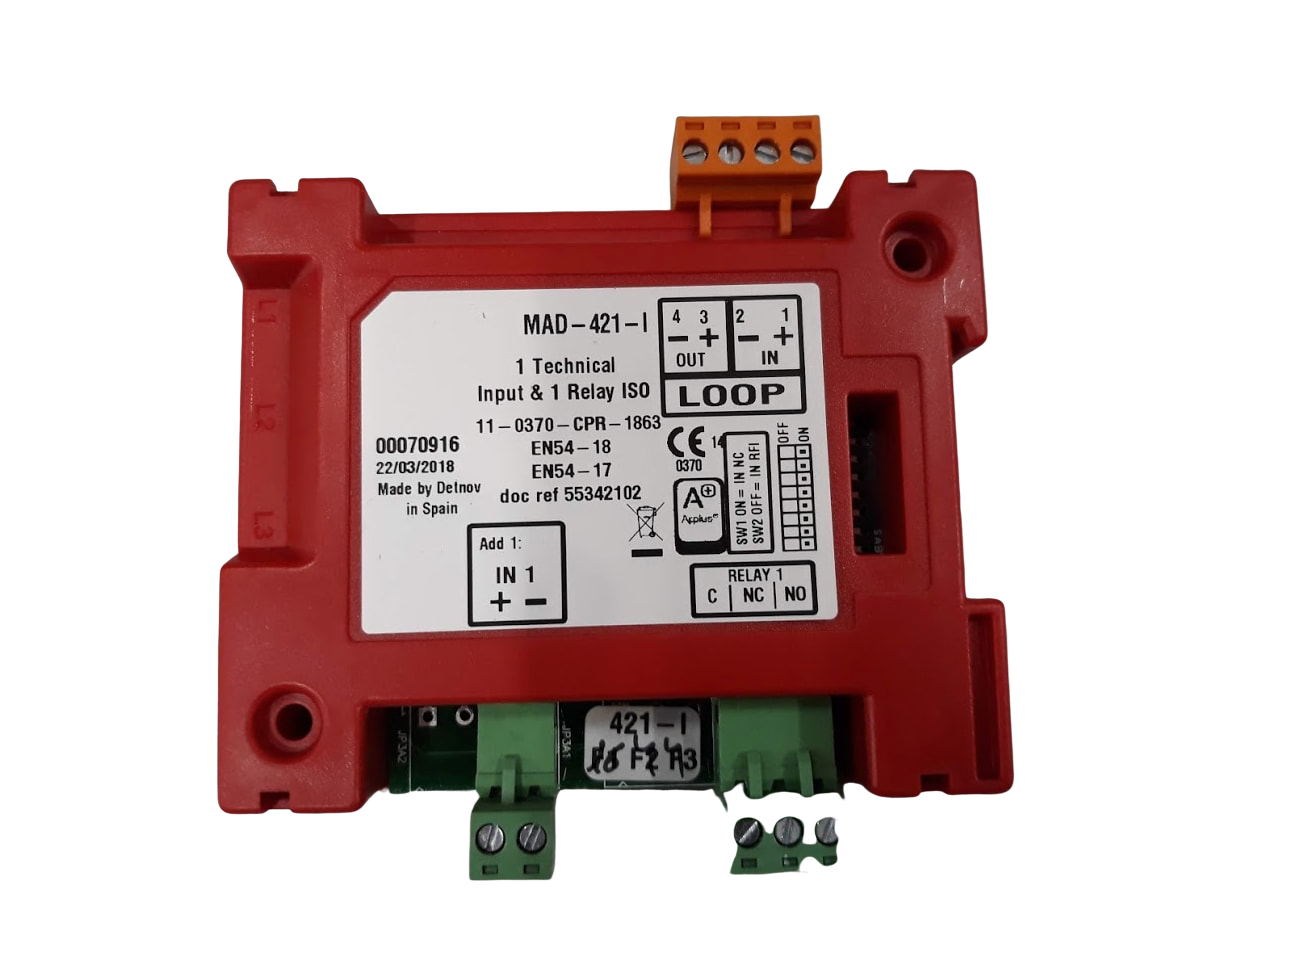 Picture of MAD-421-I  Διευθυνσιοδοτούμενο Module Παρακολούθησης Και Ελέγχου 1 Εισόδου Με Ενδεικτικό Λειτουργίας Για Έλεγχο Συσκευών Και 1 Έ